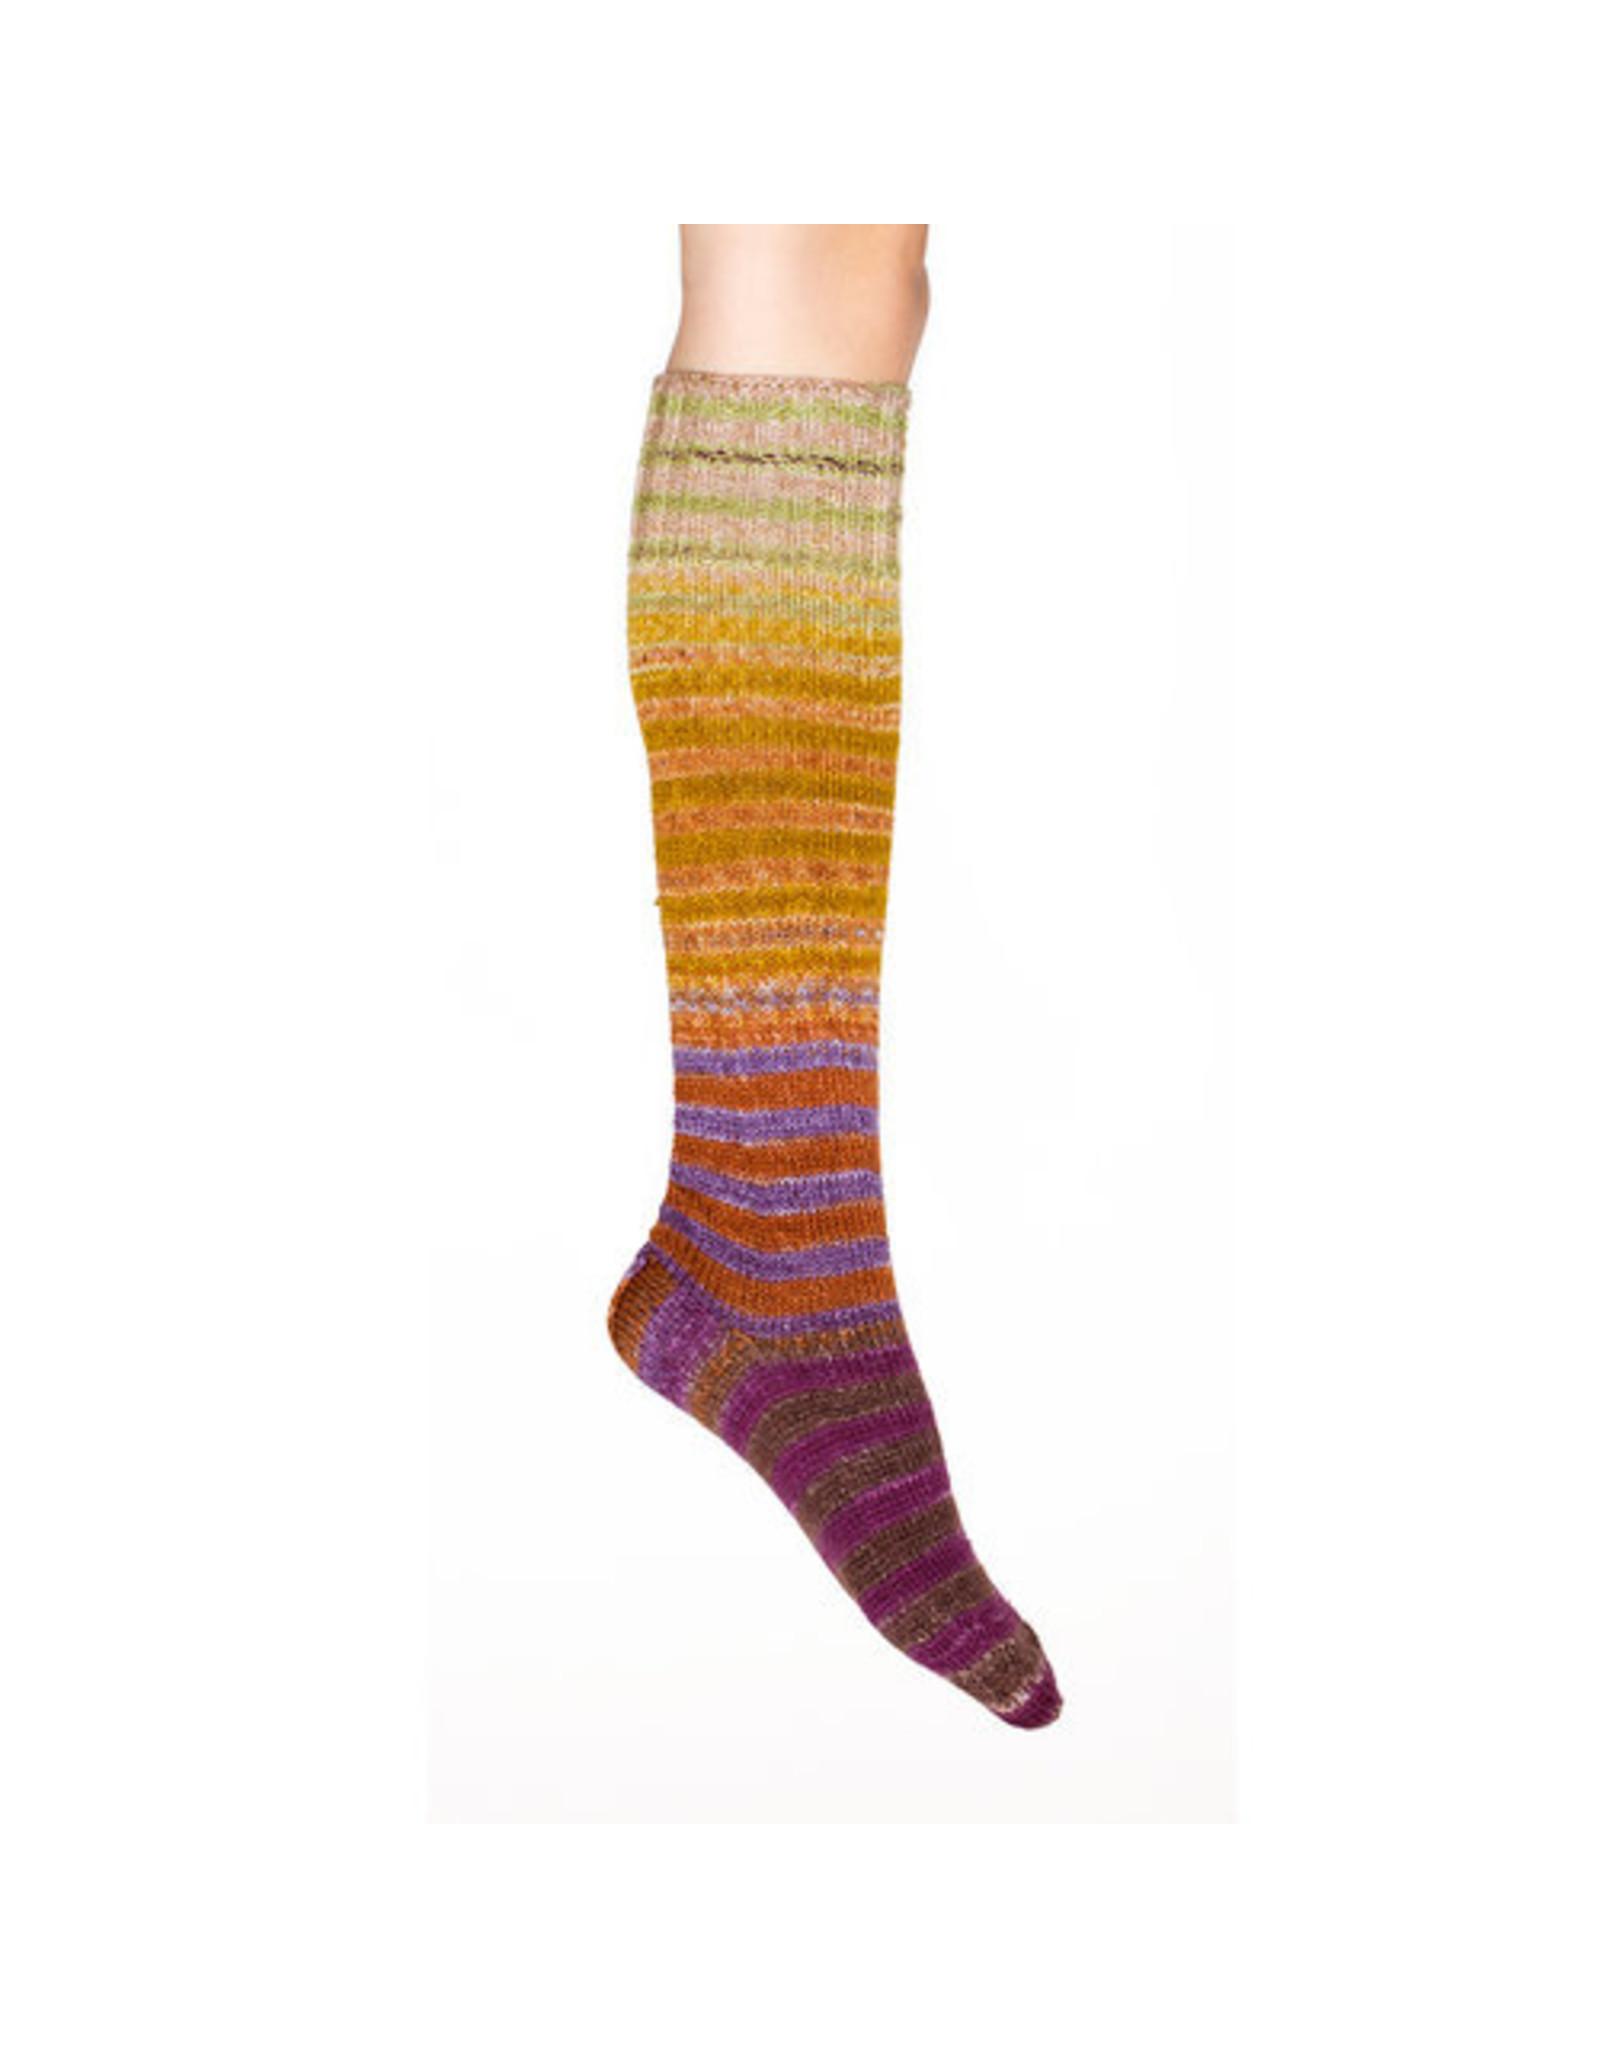 Uneek Uneek URTH Sock Kit